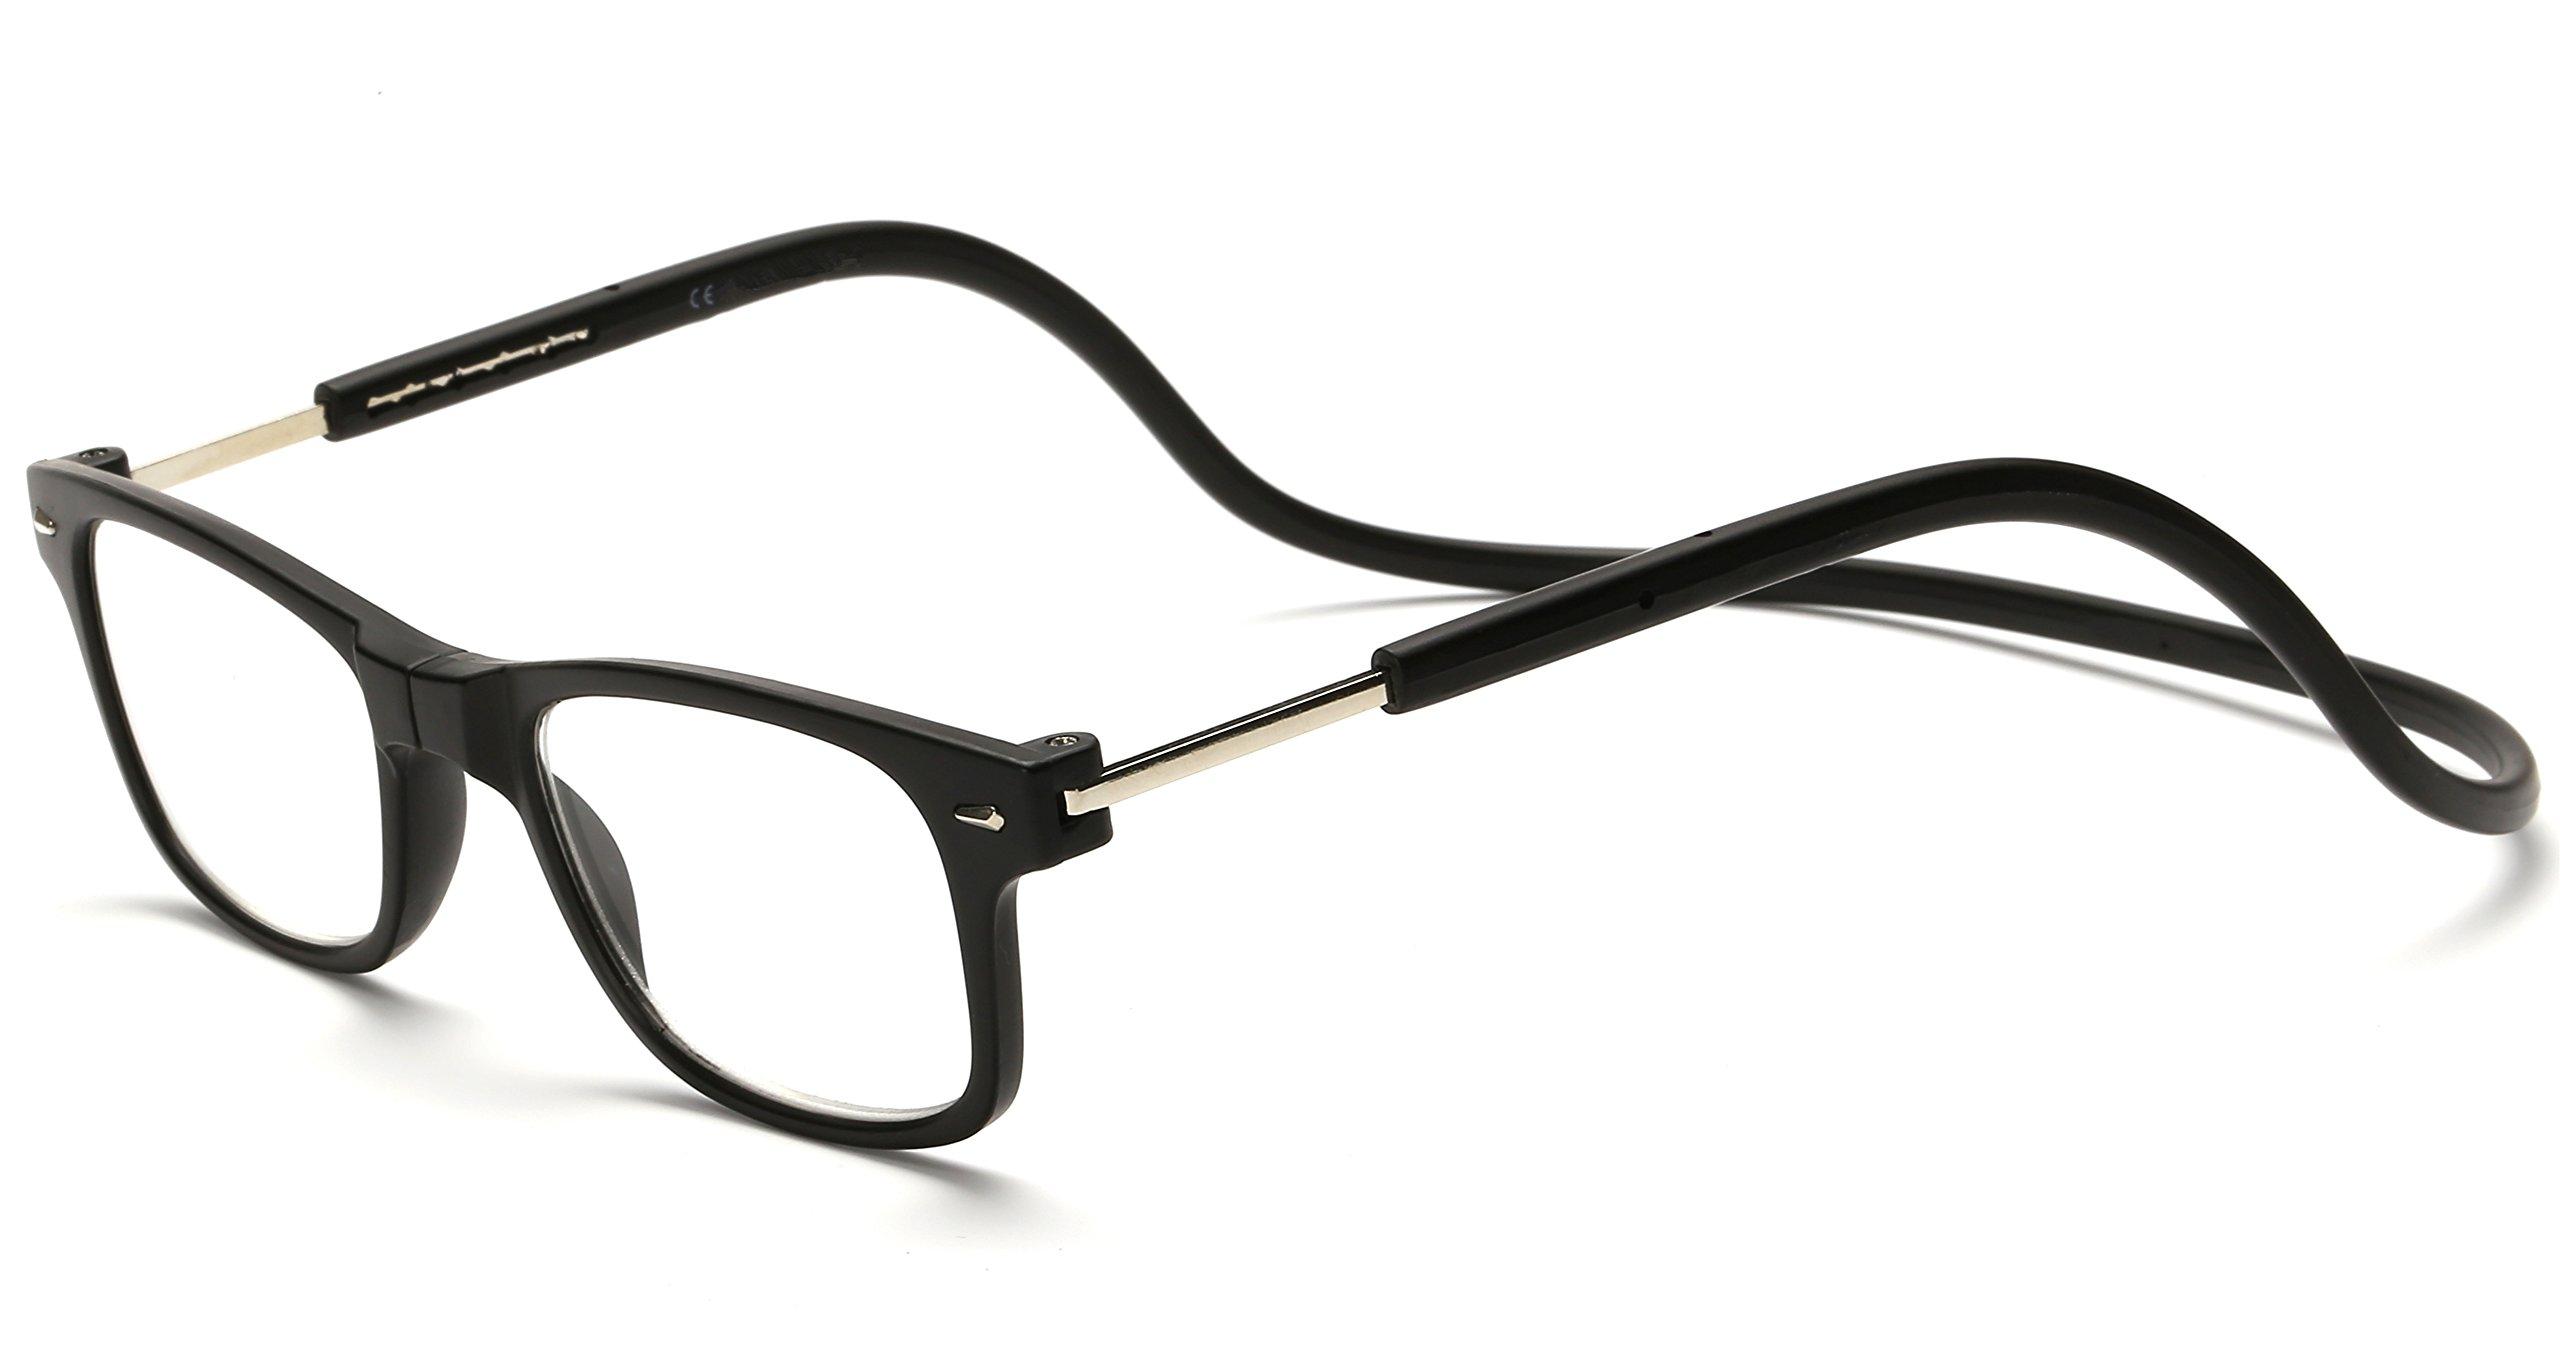 Adjustable Front Connect Reader Click Magnetic Reading Glasses Black 200